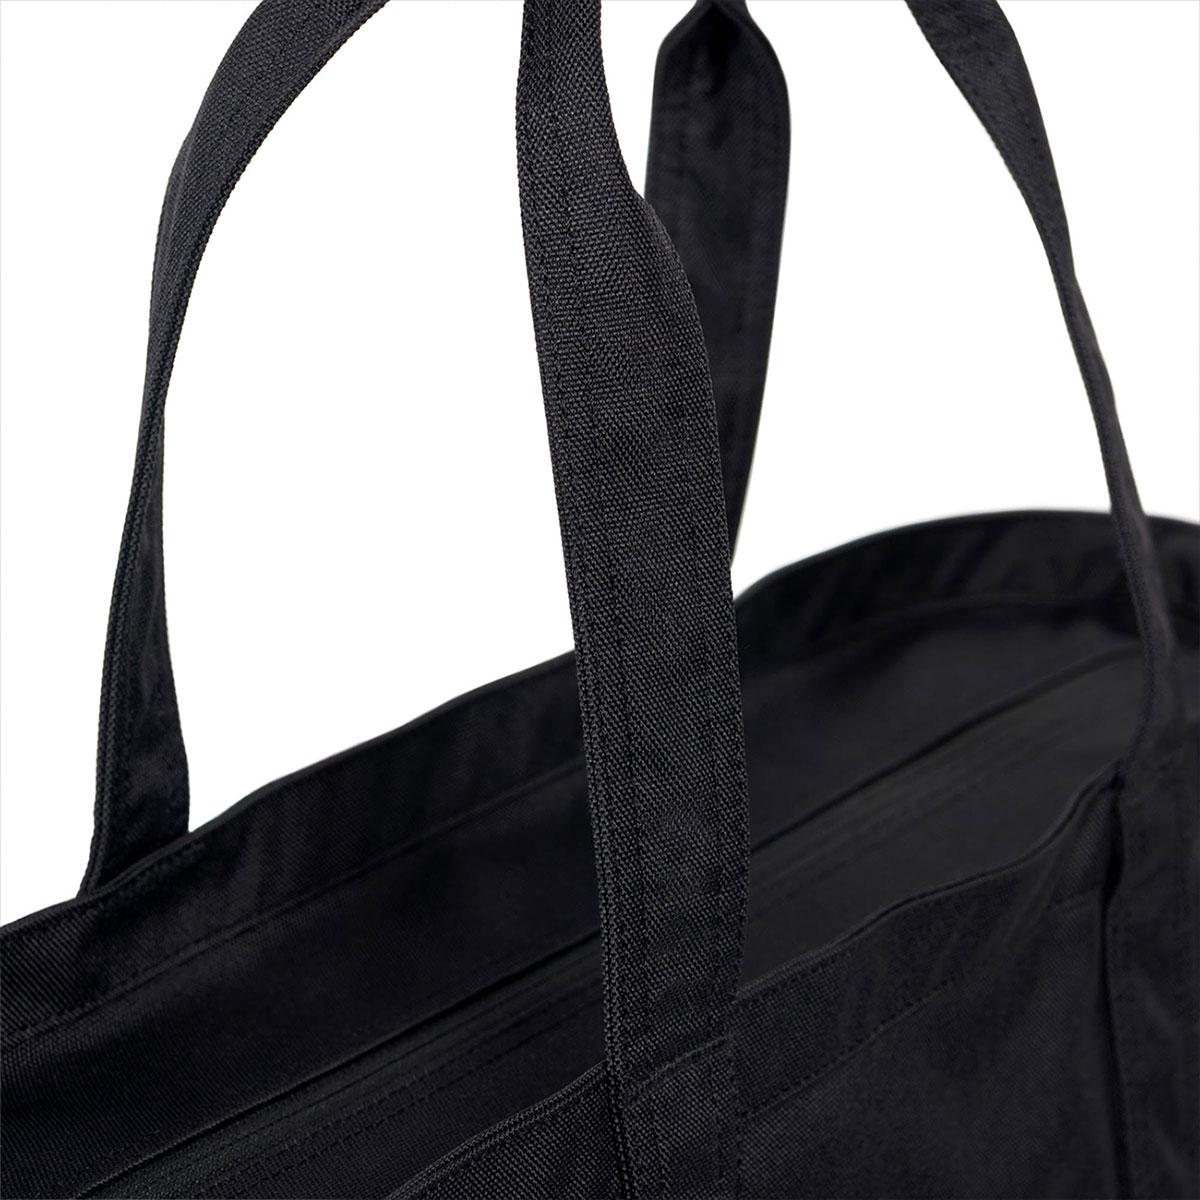 4441020424 Hershel supply Herschel Supply regular store bag tote bag BAMFIELD  MID-VOLUME TOTE BAG CLASSICS